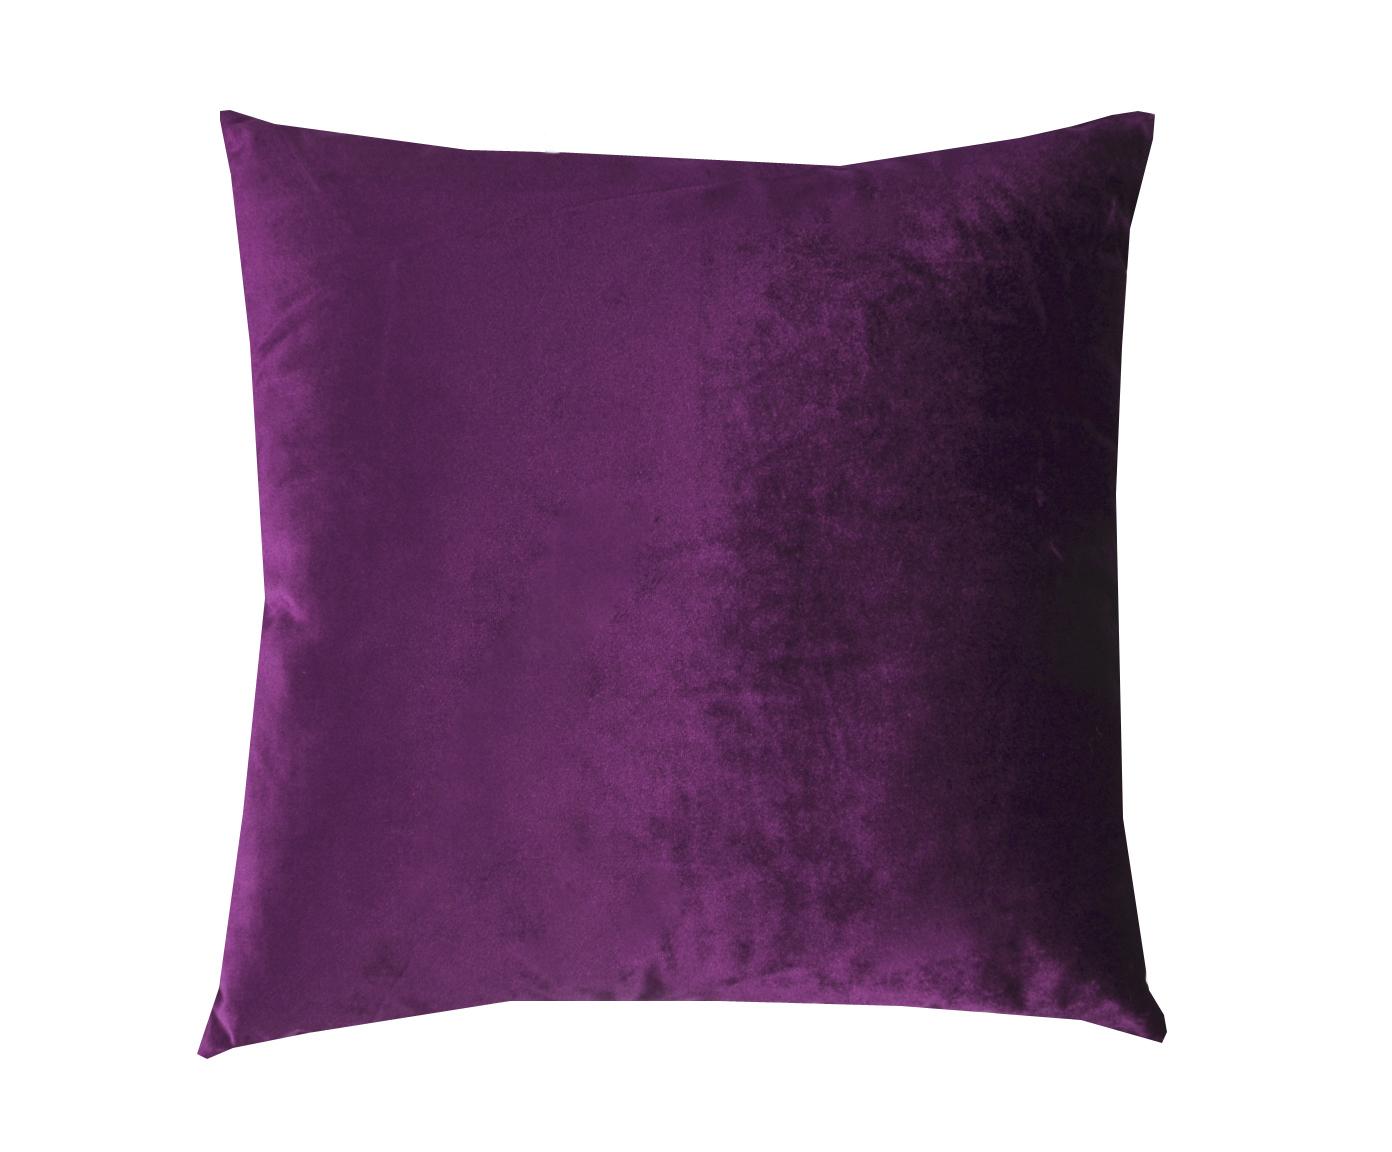 Подушка декоративная Houte coutureКвадратные подушки и наволочки<br>Декоративная  подушка .Чехол съемный.<br><br>Material: Бархат<br>Ширина см: 45<br>Высота см: 45<br>Глубина см: 15